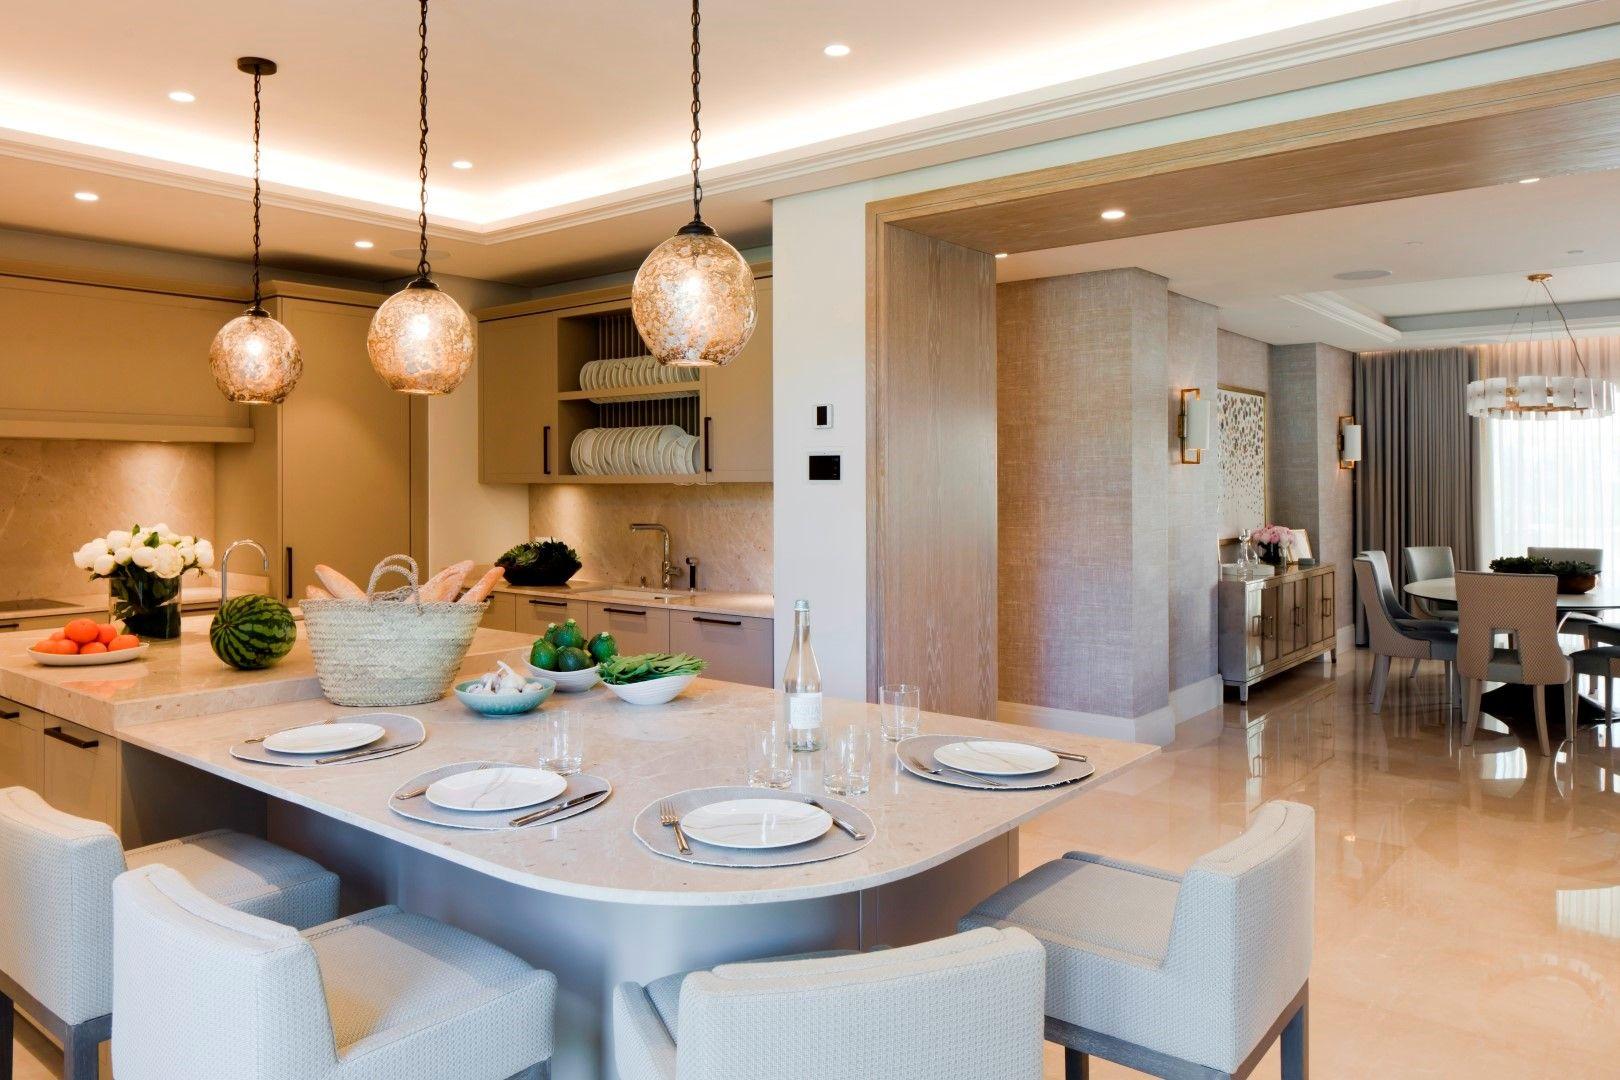 Luxury Spanish Interior Design For This Recent Marbella Project